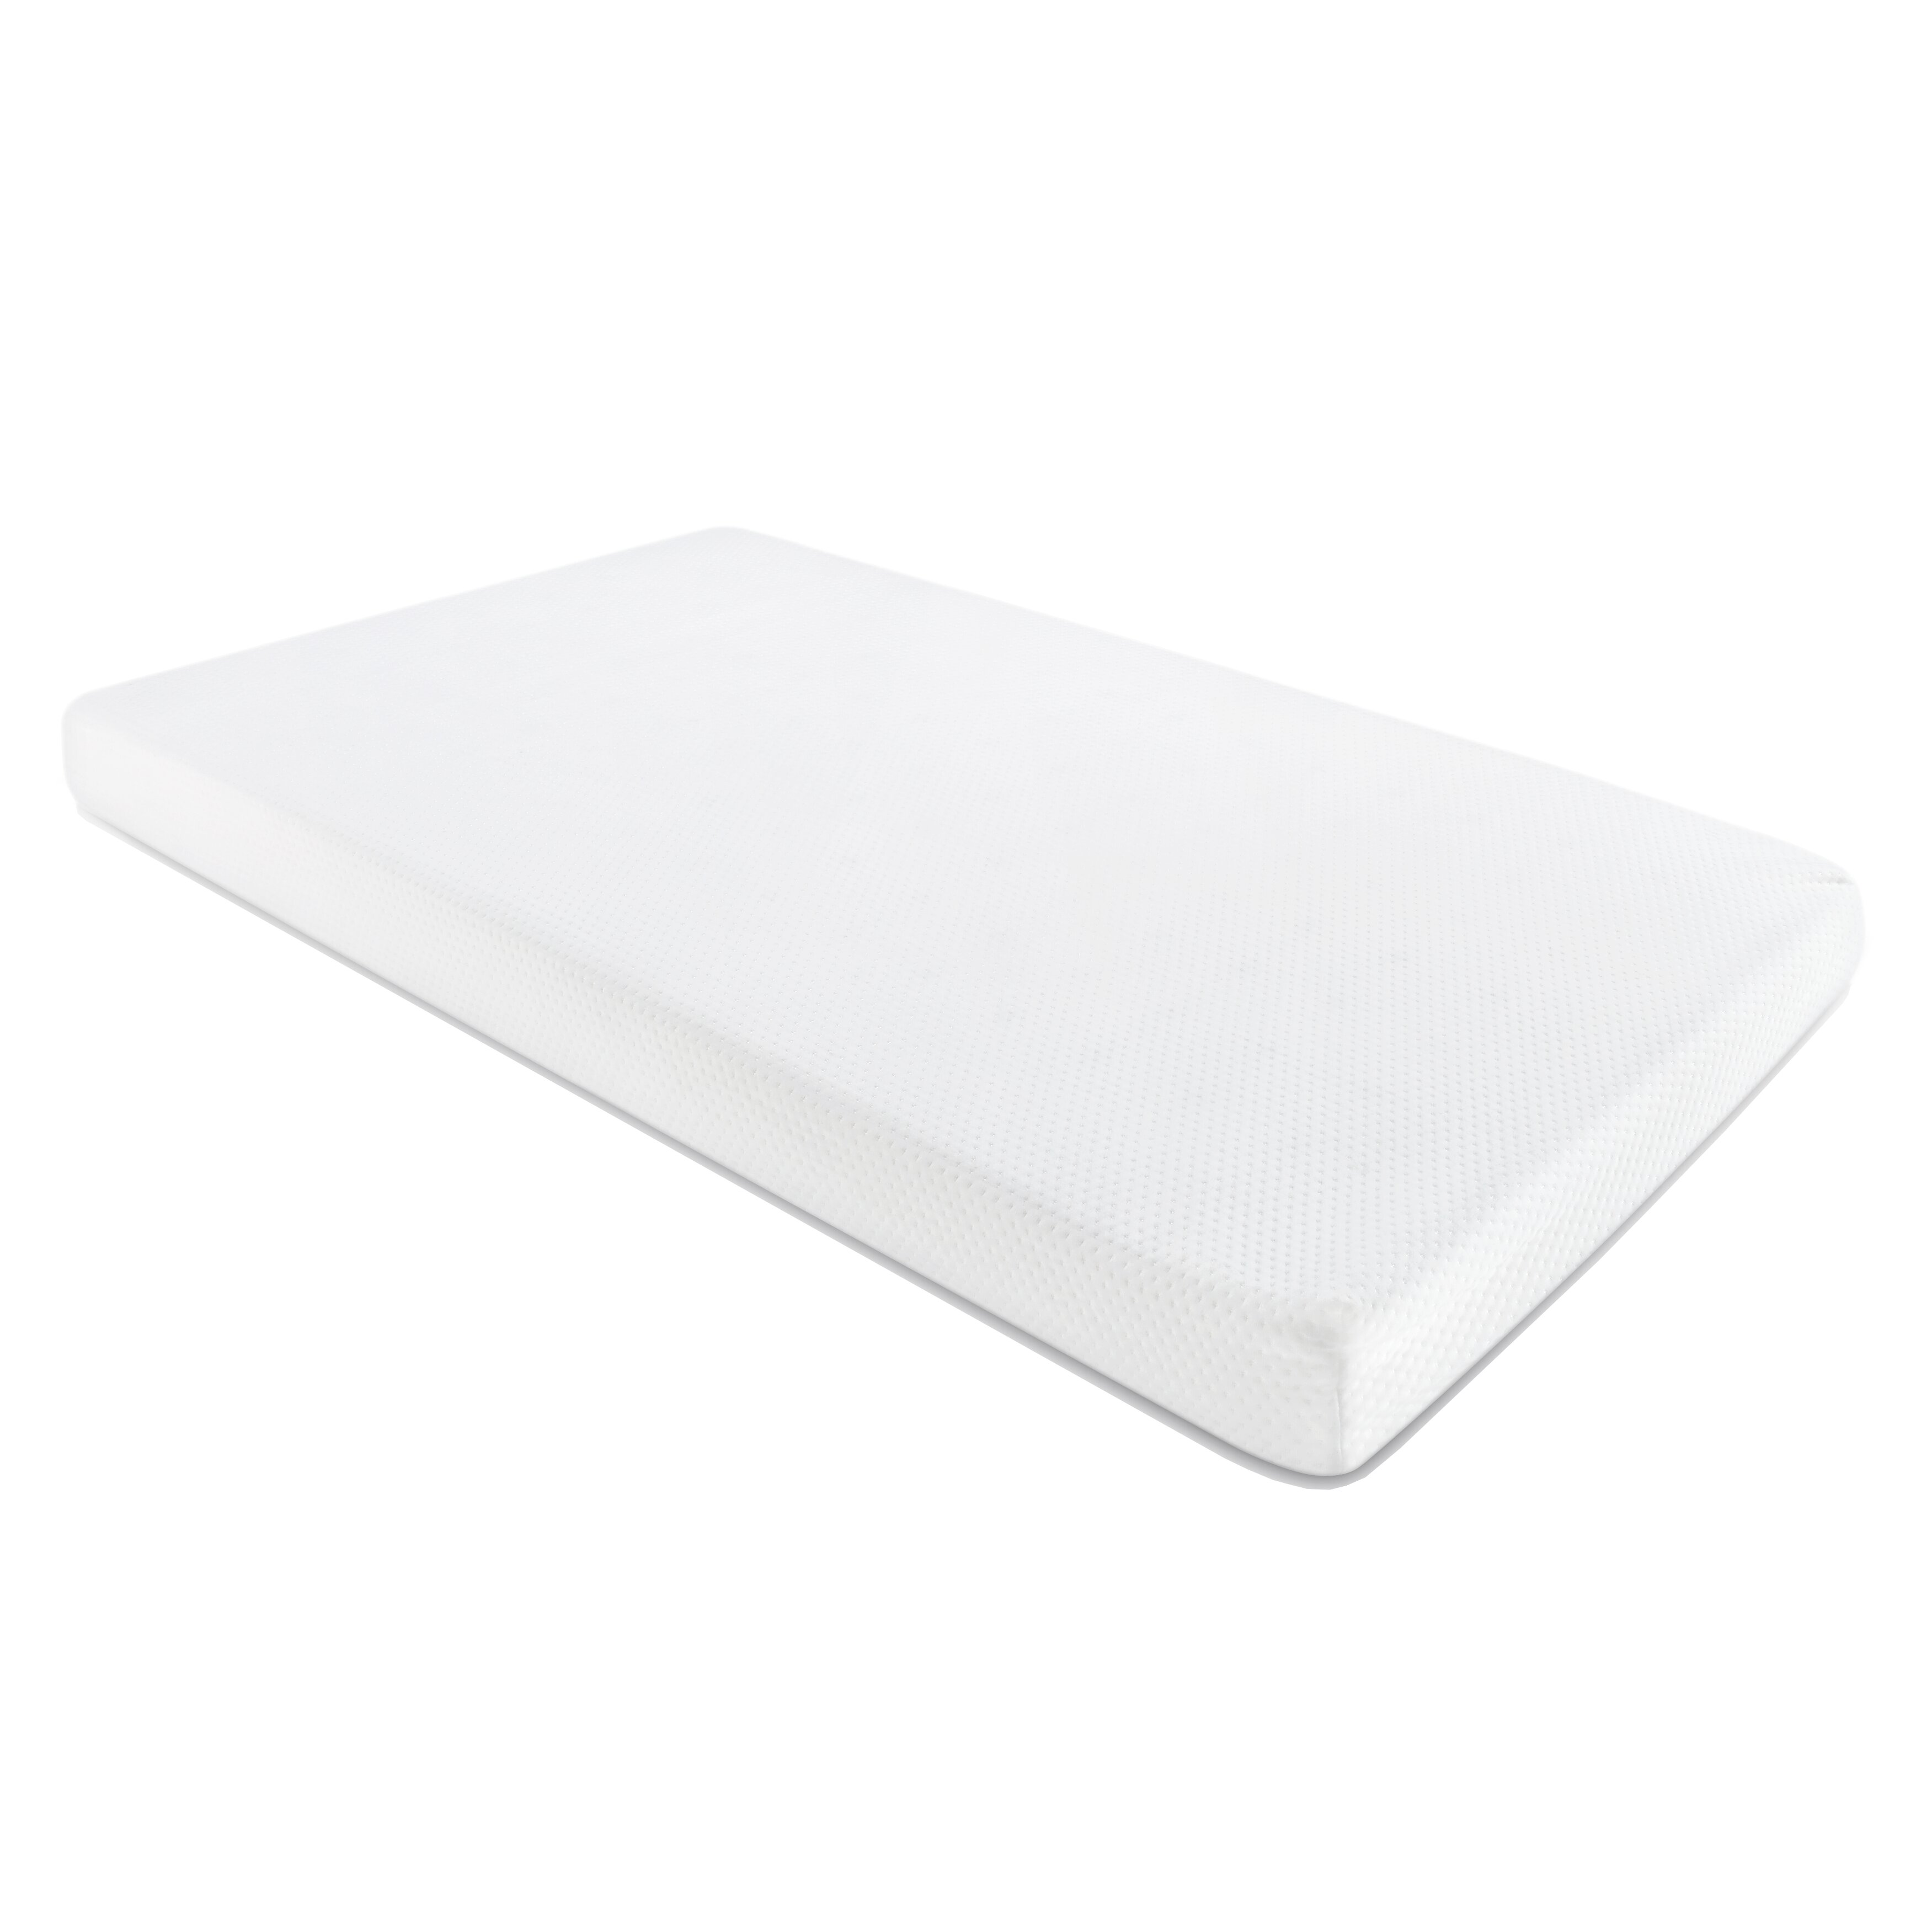 Graco Premium Foam Crib and Toddler Bed Mattress & Reviews